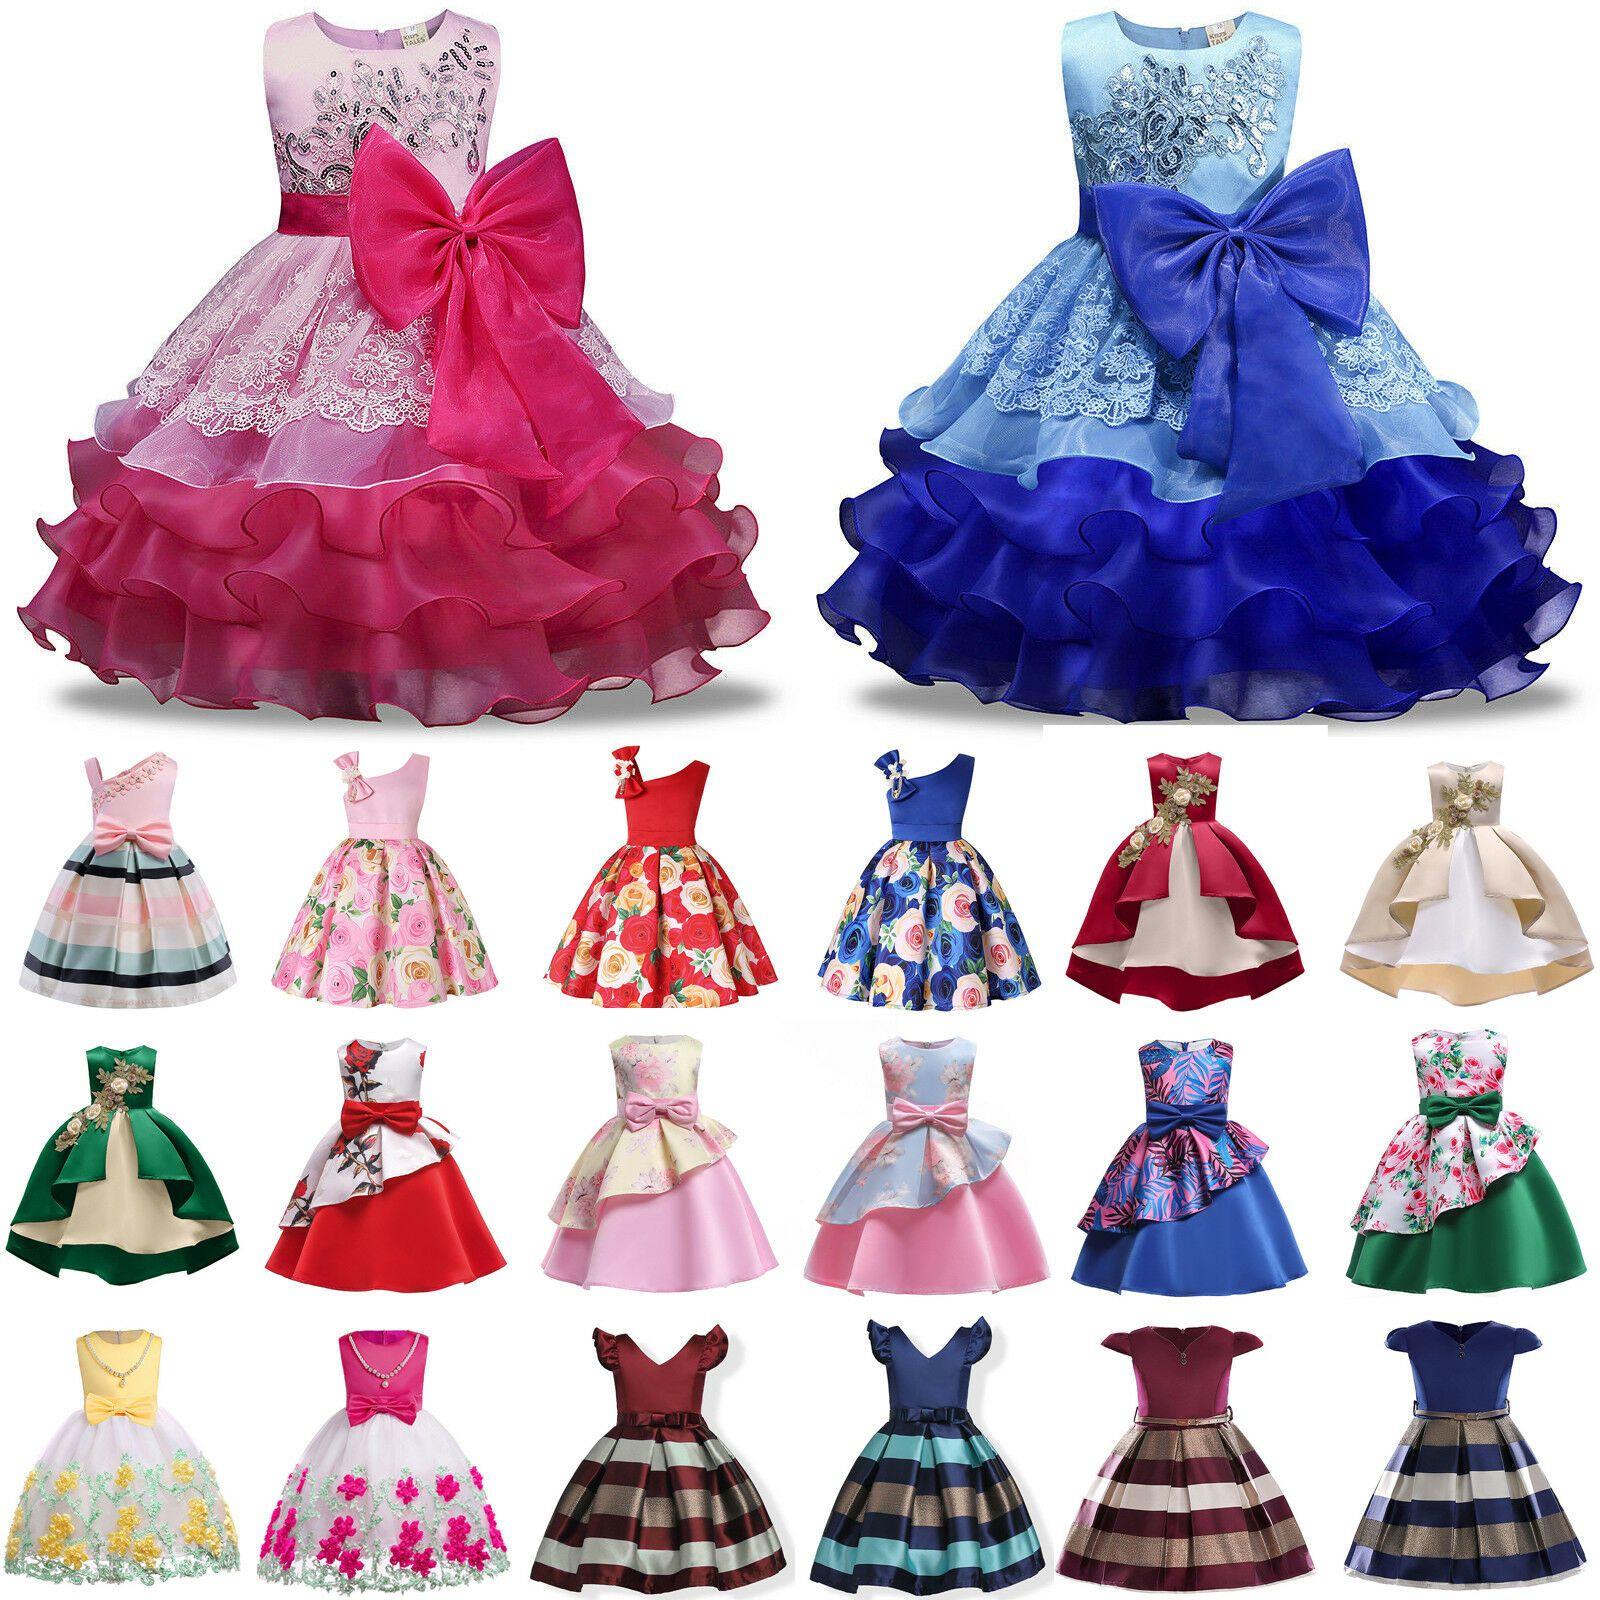 Tutu Bridesmaid Wedding Party Girl Flower Formal Baby Kid Princess Dresses Dress